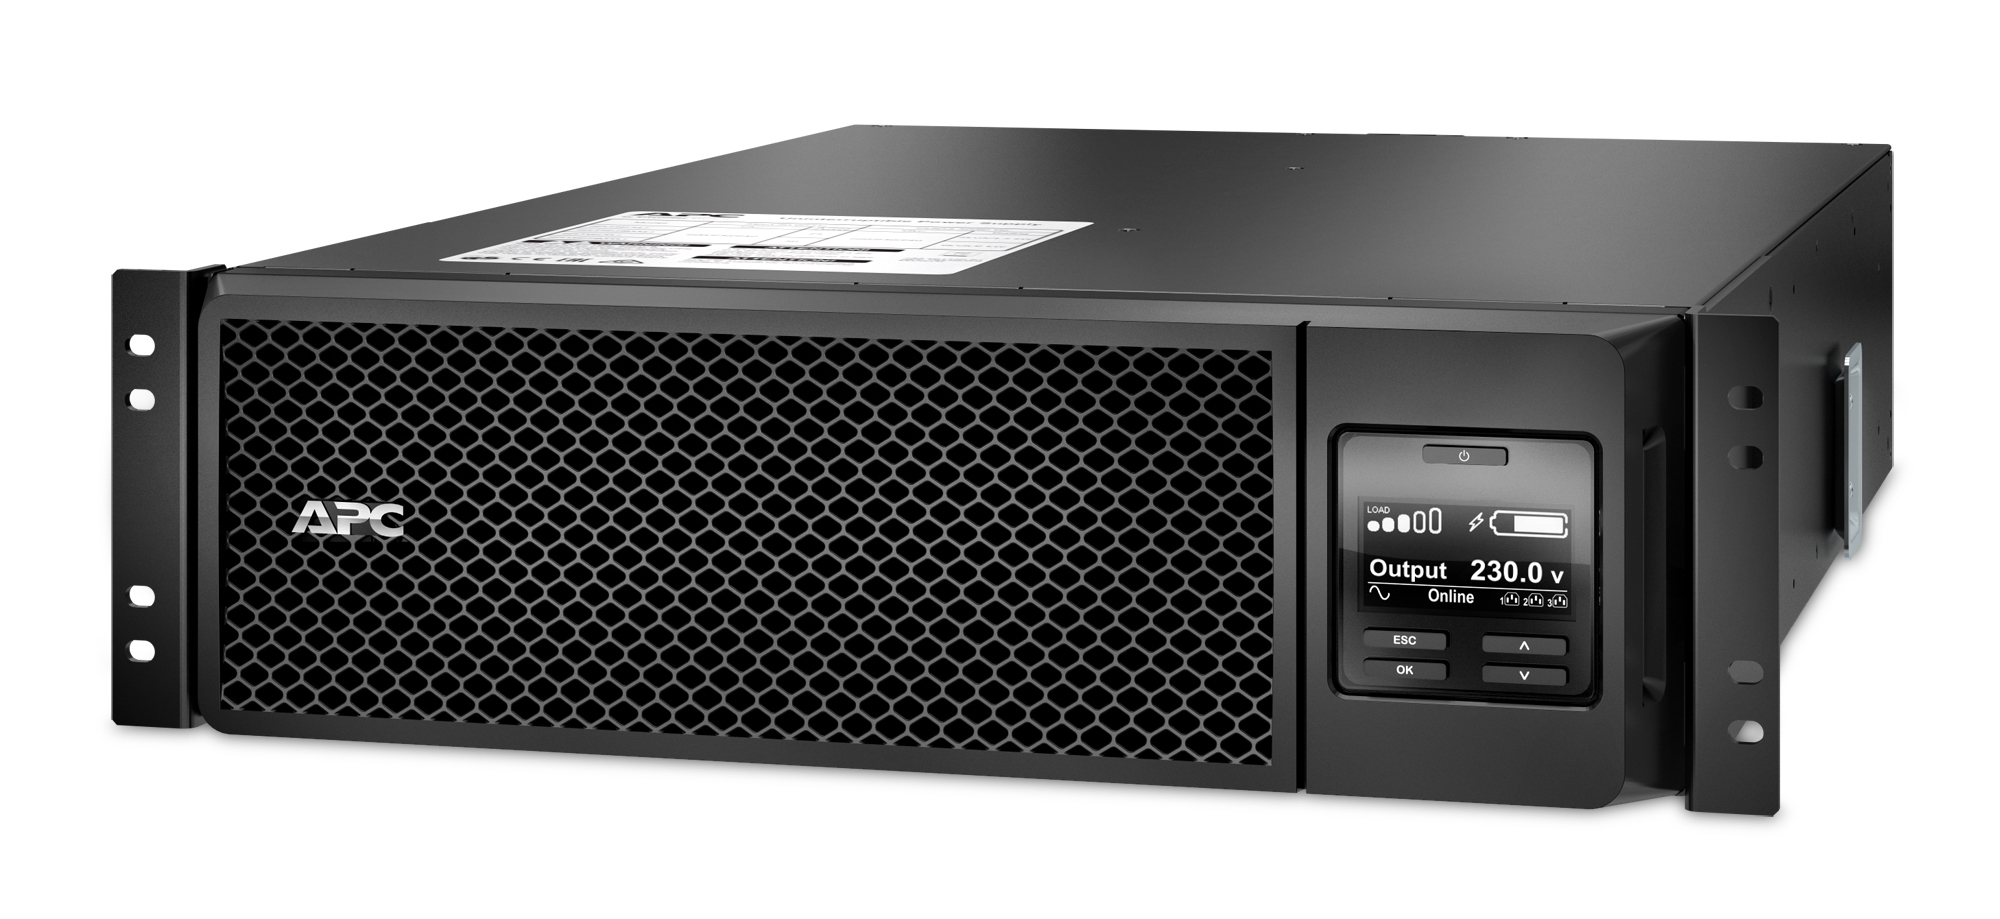 APC Smart-UPS On-Line uninterruptible power supply (UPS) Double-conversion (Online) 5000 VA 4500 W 10 AC outlet(s)